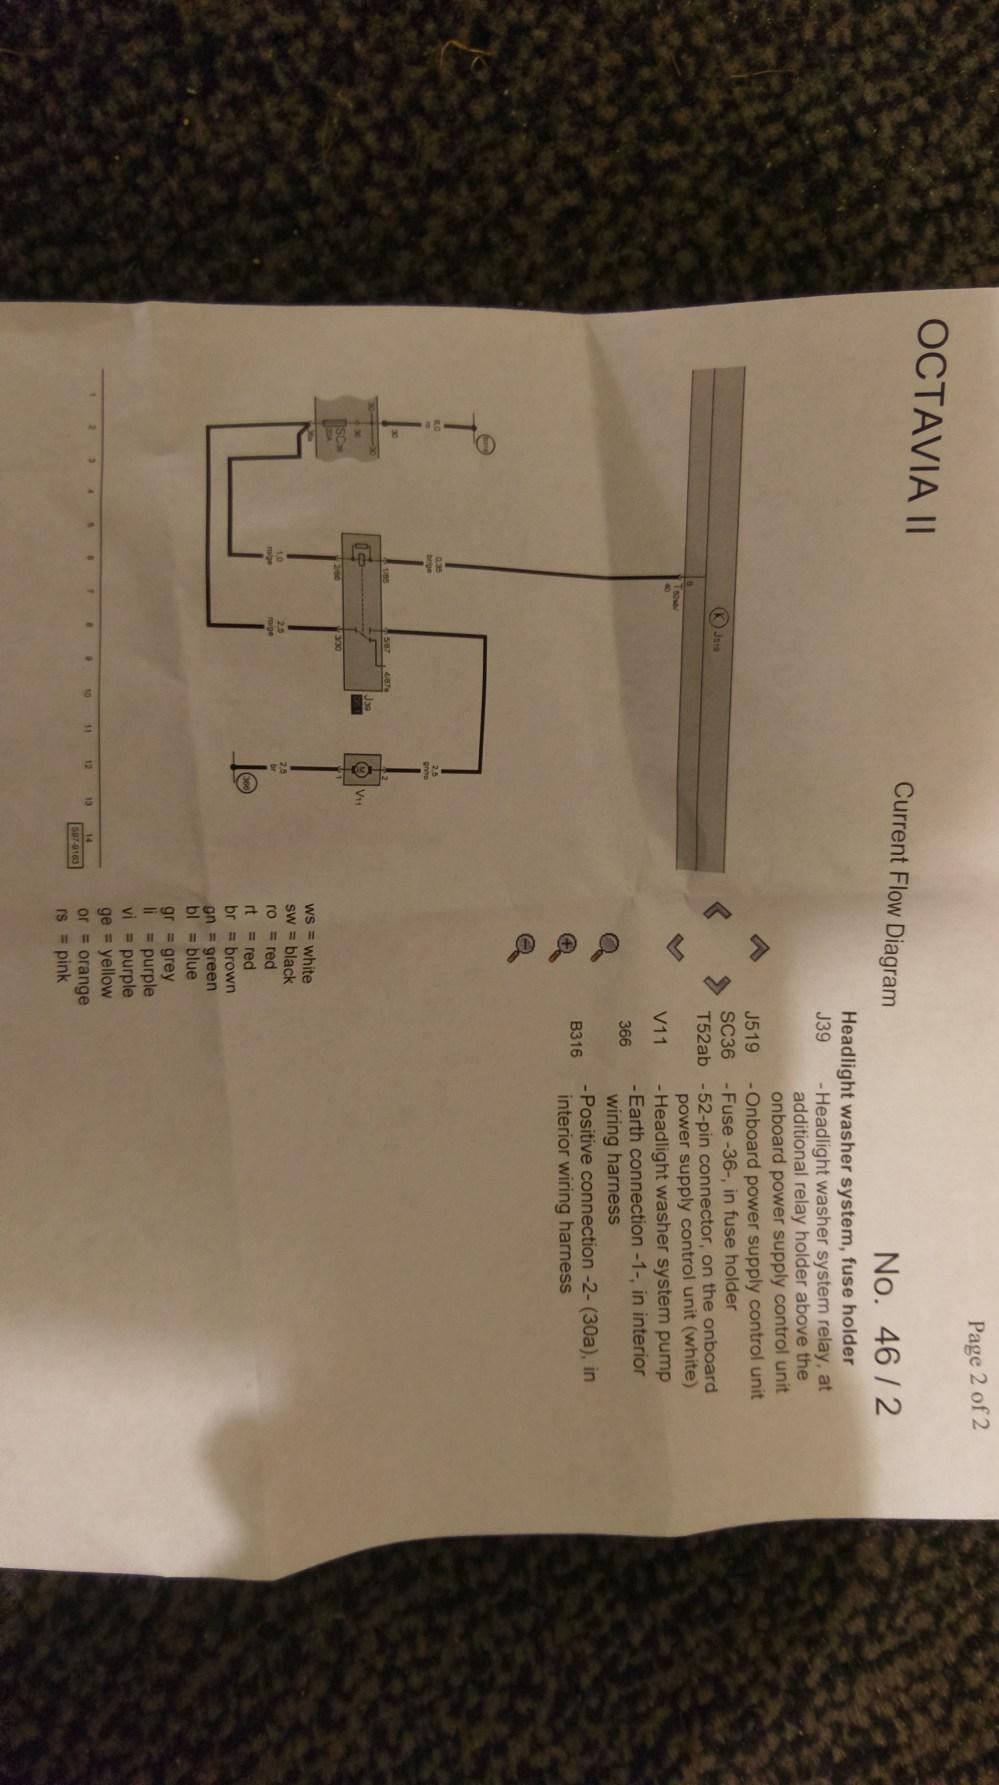 medium resolution of headlight washer relay and wiring skoda octavia mk ii 2004 2013 skoda octavia headlight wiring diagram